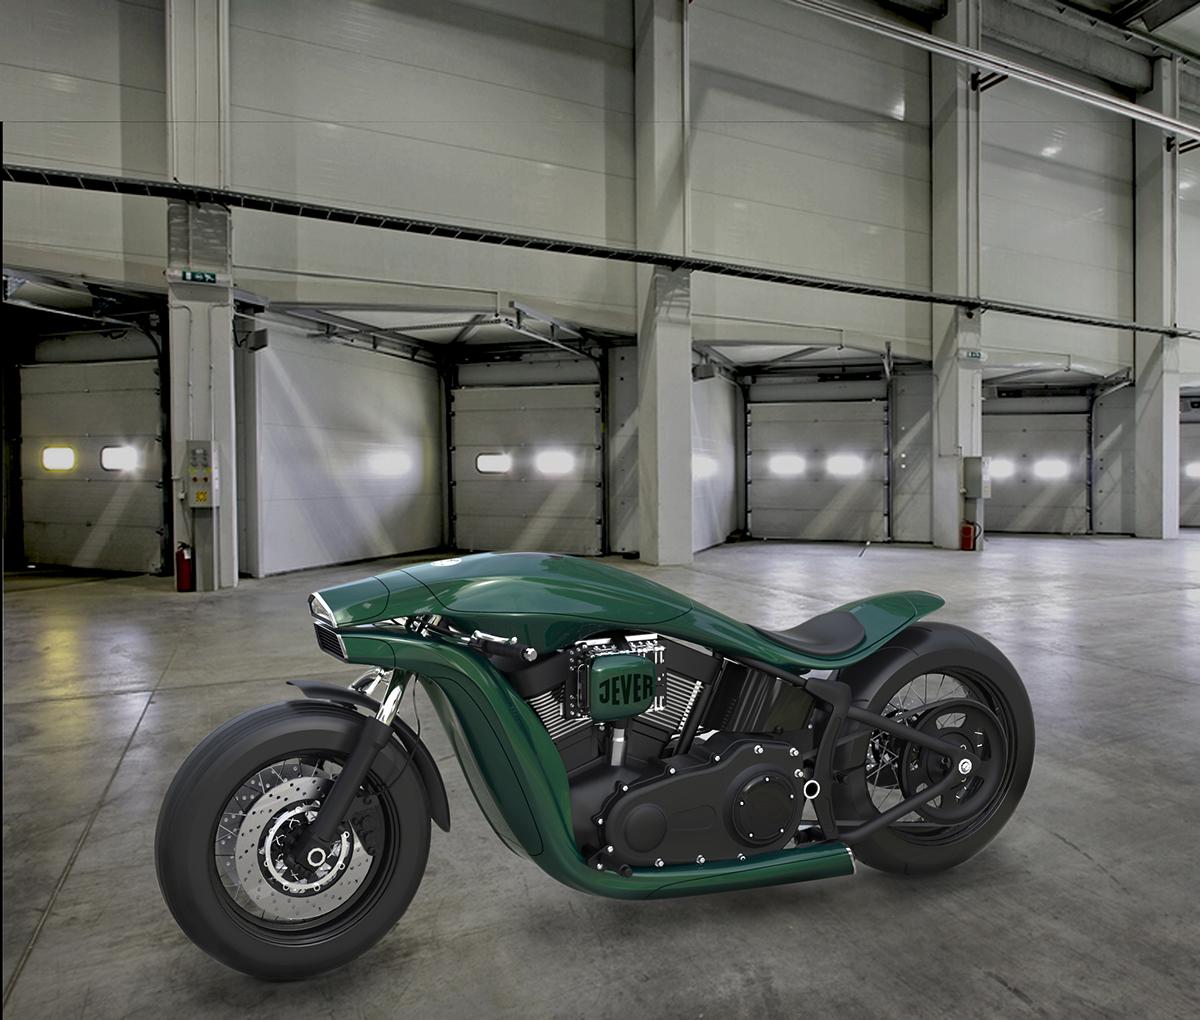 Harley Davidson Softail Concept 4